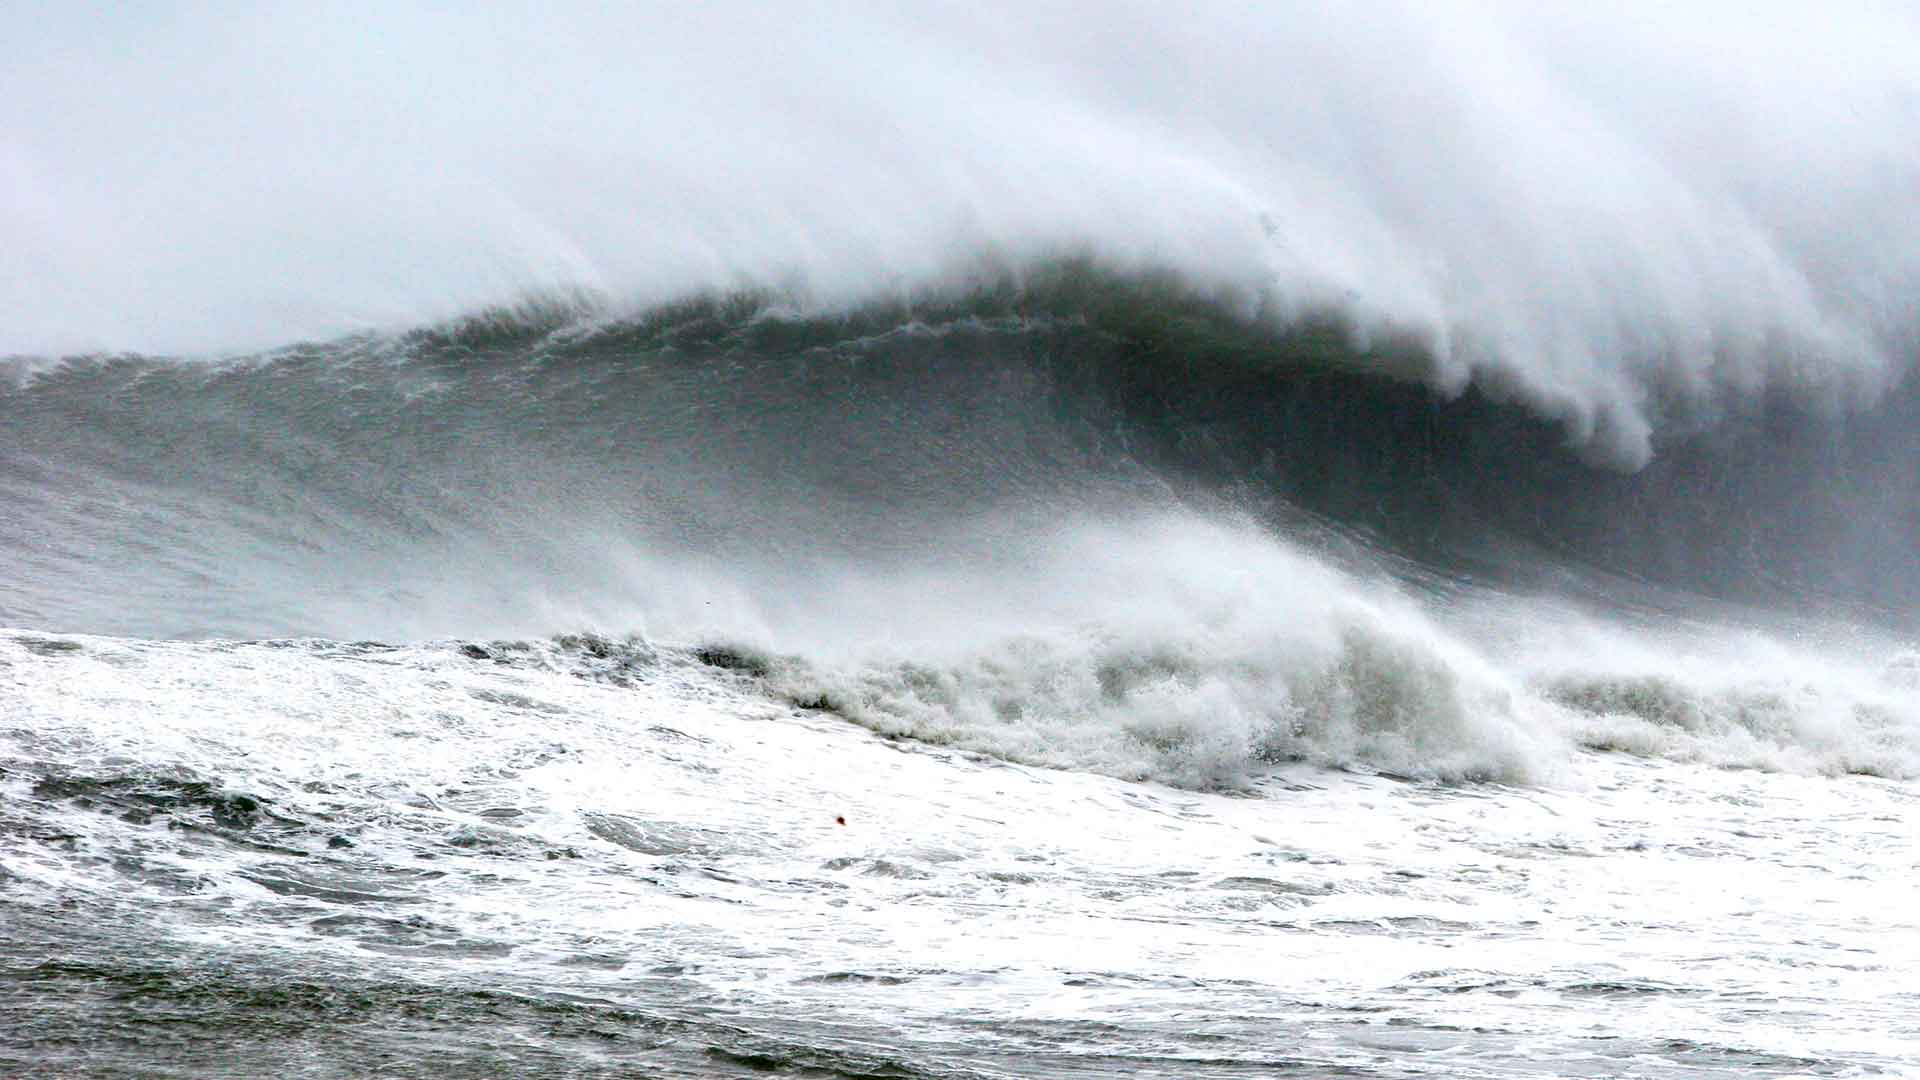 Steven Andrew Martin | Typhoon Shan Shan – Fulong Beach, Taiwan | Sureer's Journal | Learning Adventures